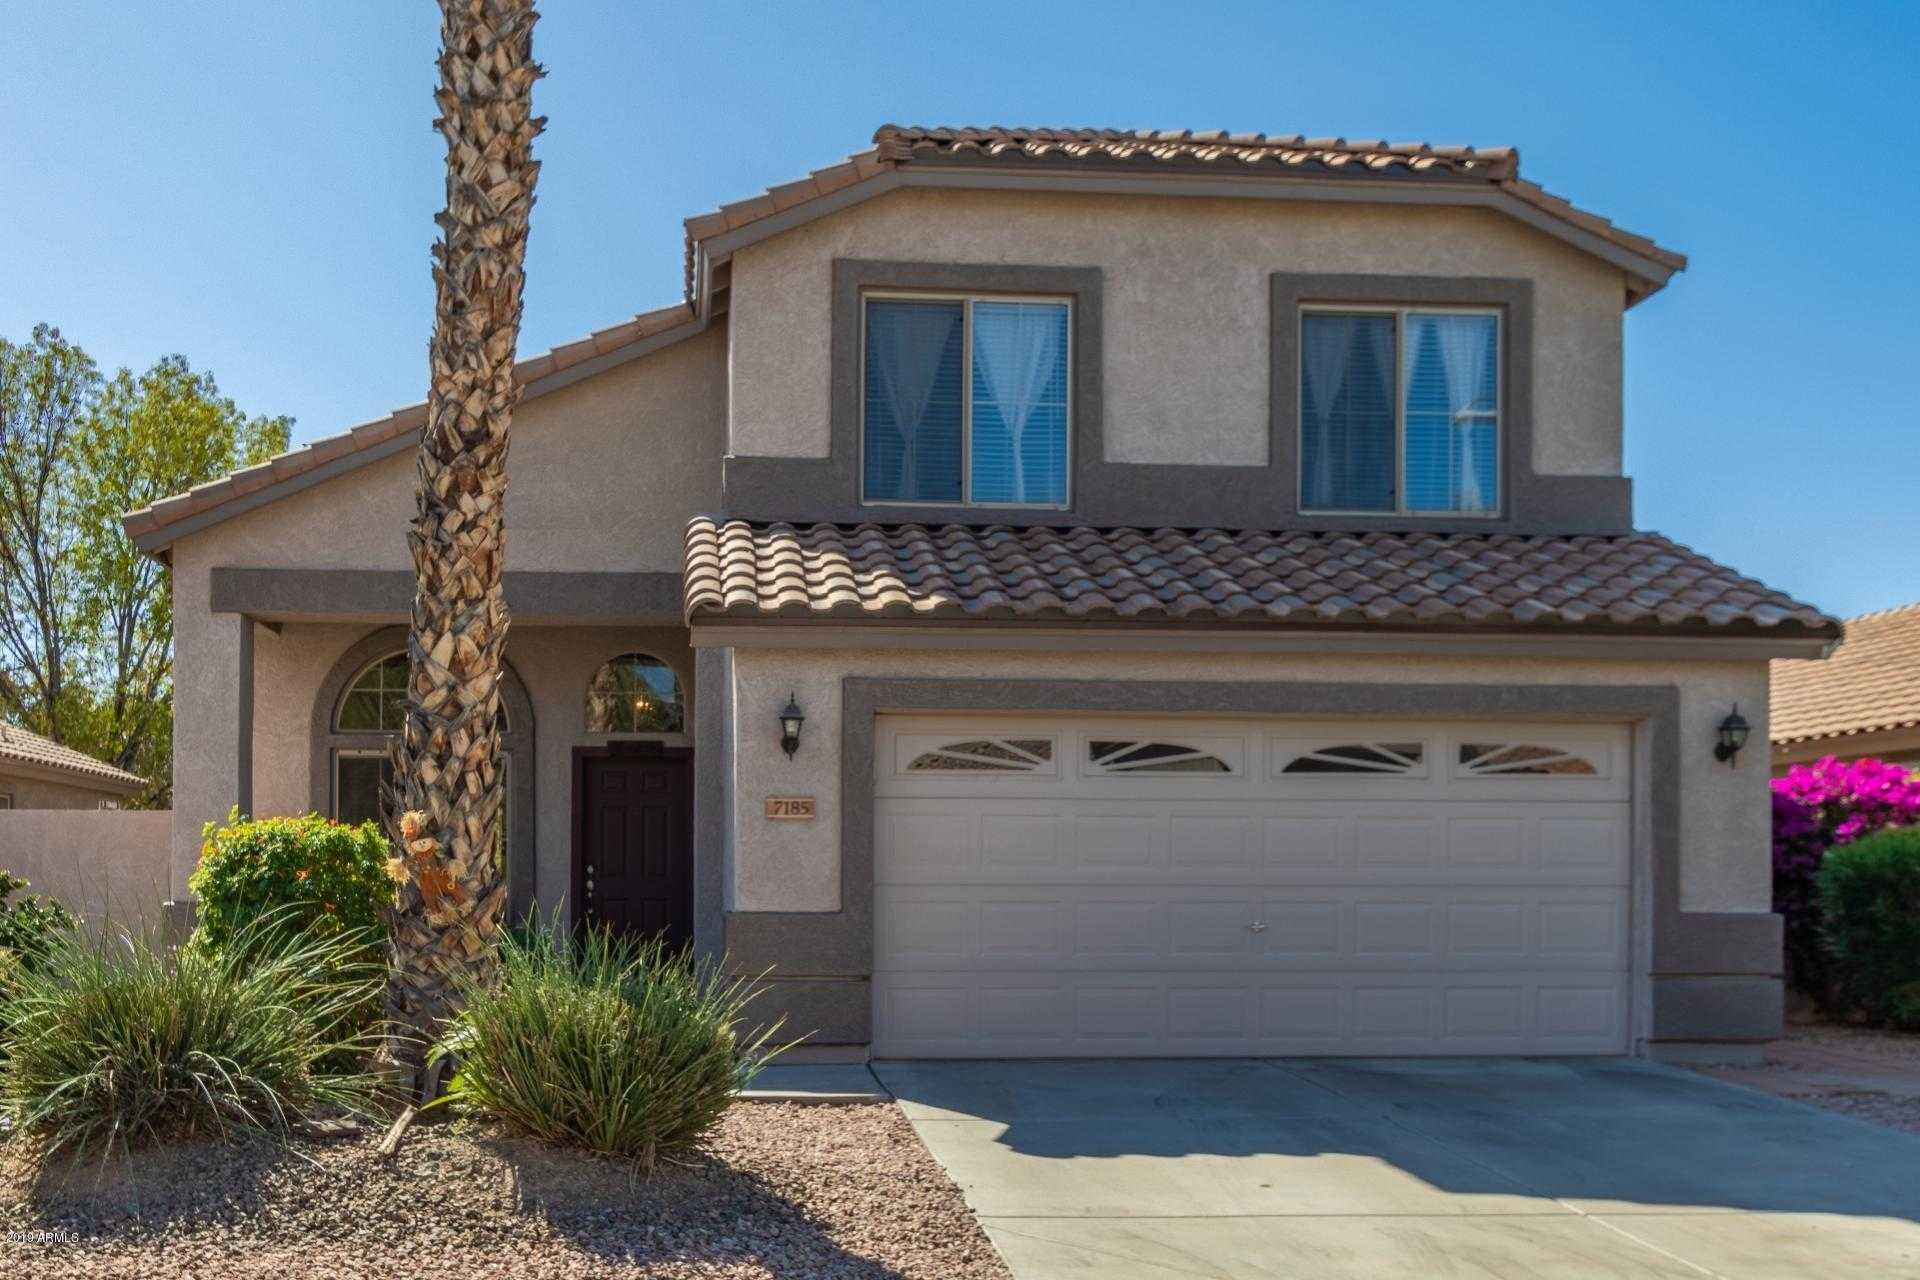 $340,000 - 3Br/3Ba - Home for Sale in Valencia 2, Glendale